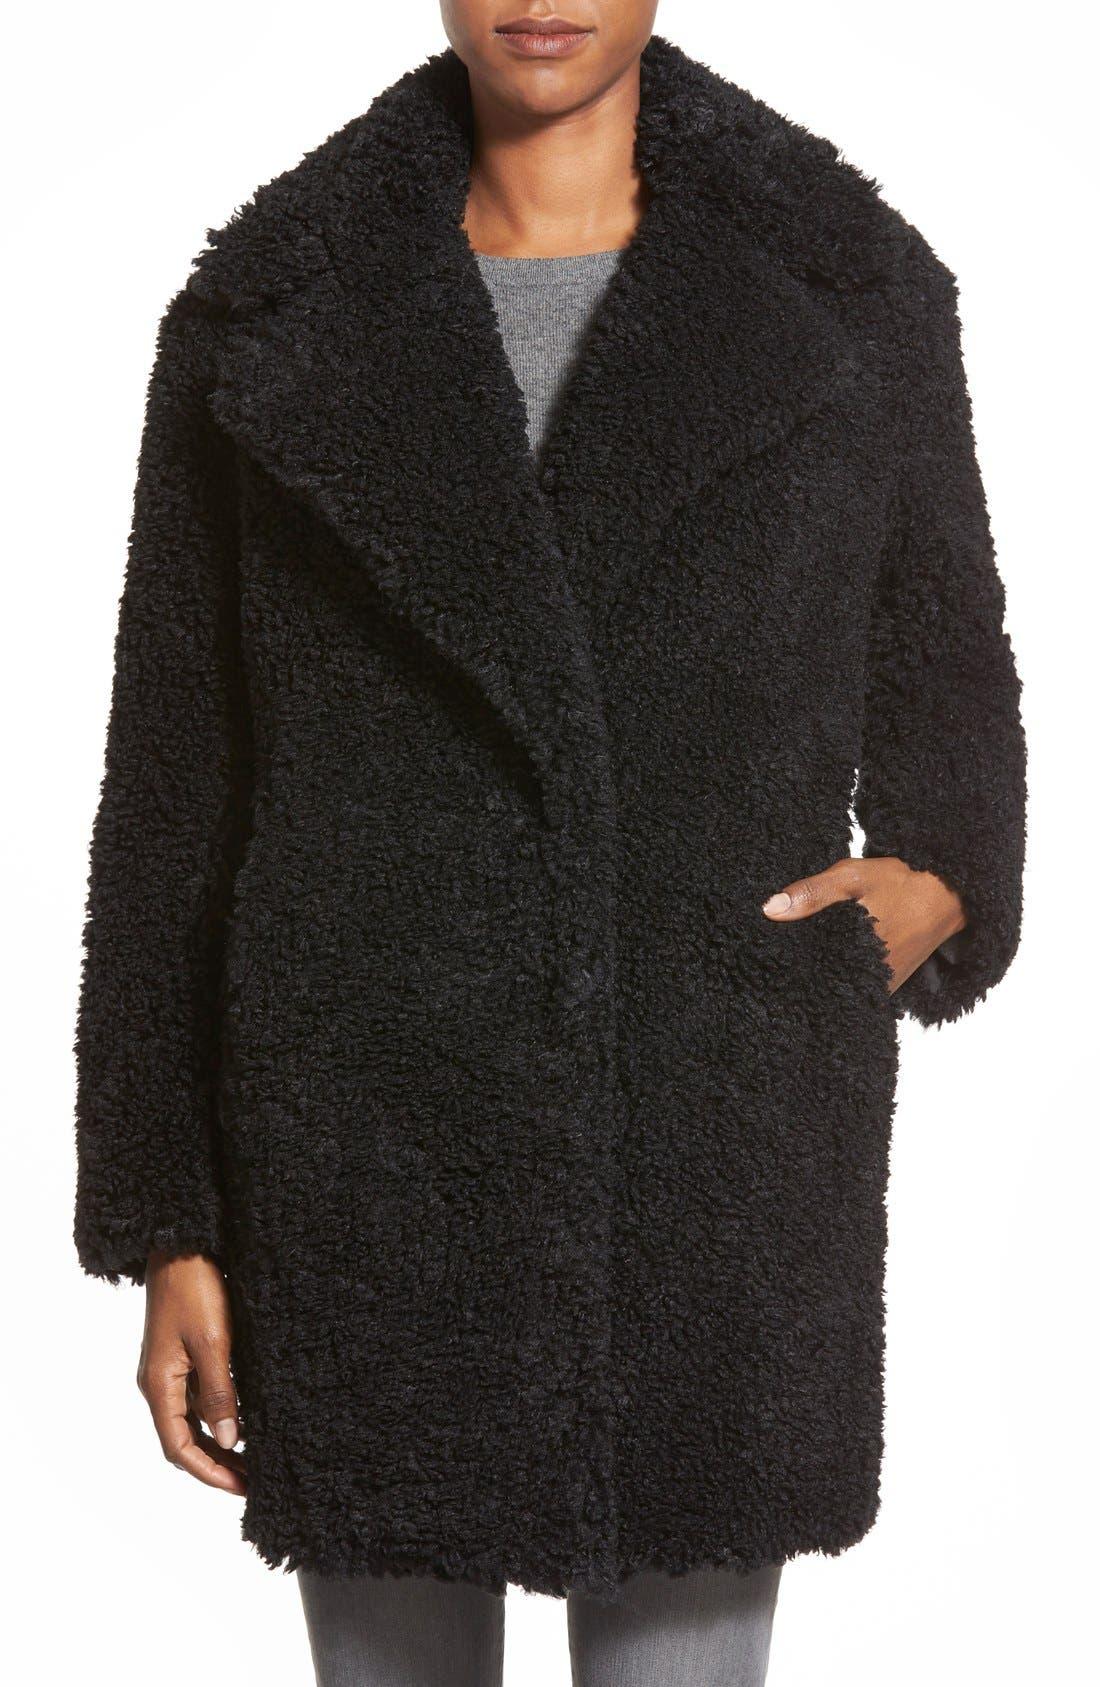 Alternate Image 1 Selected - kensie 'Teddy Bear' Notch Collar Faux Fur Coat (Online Only)